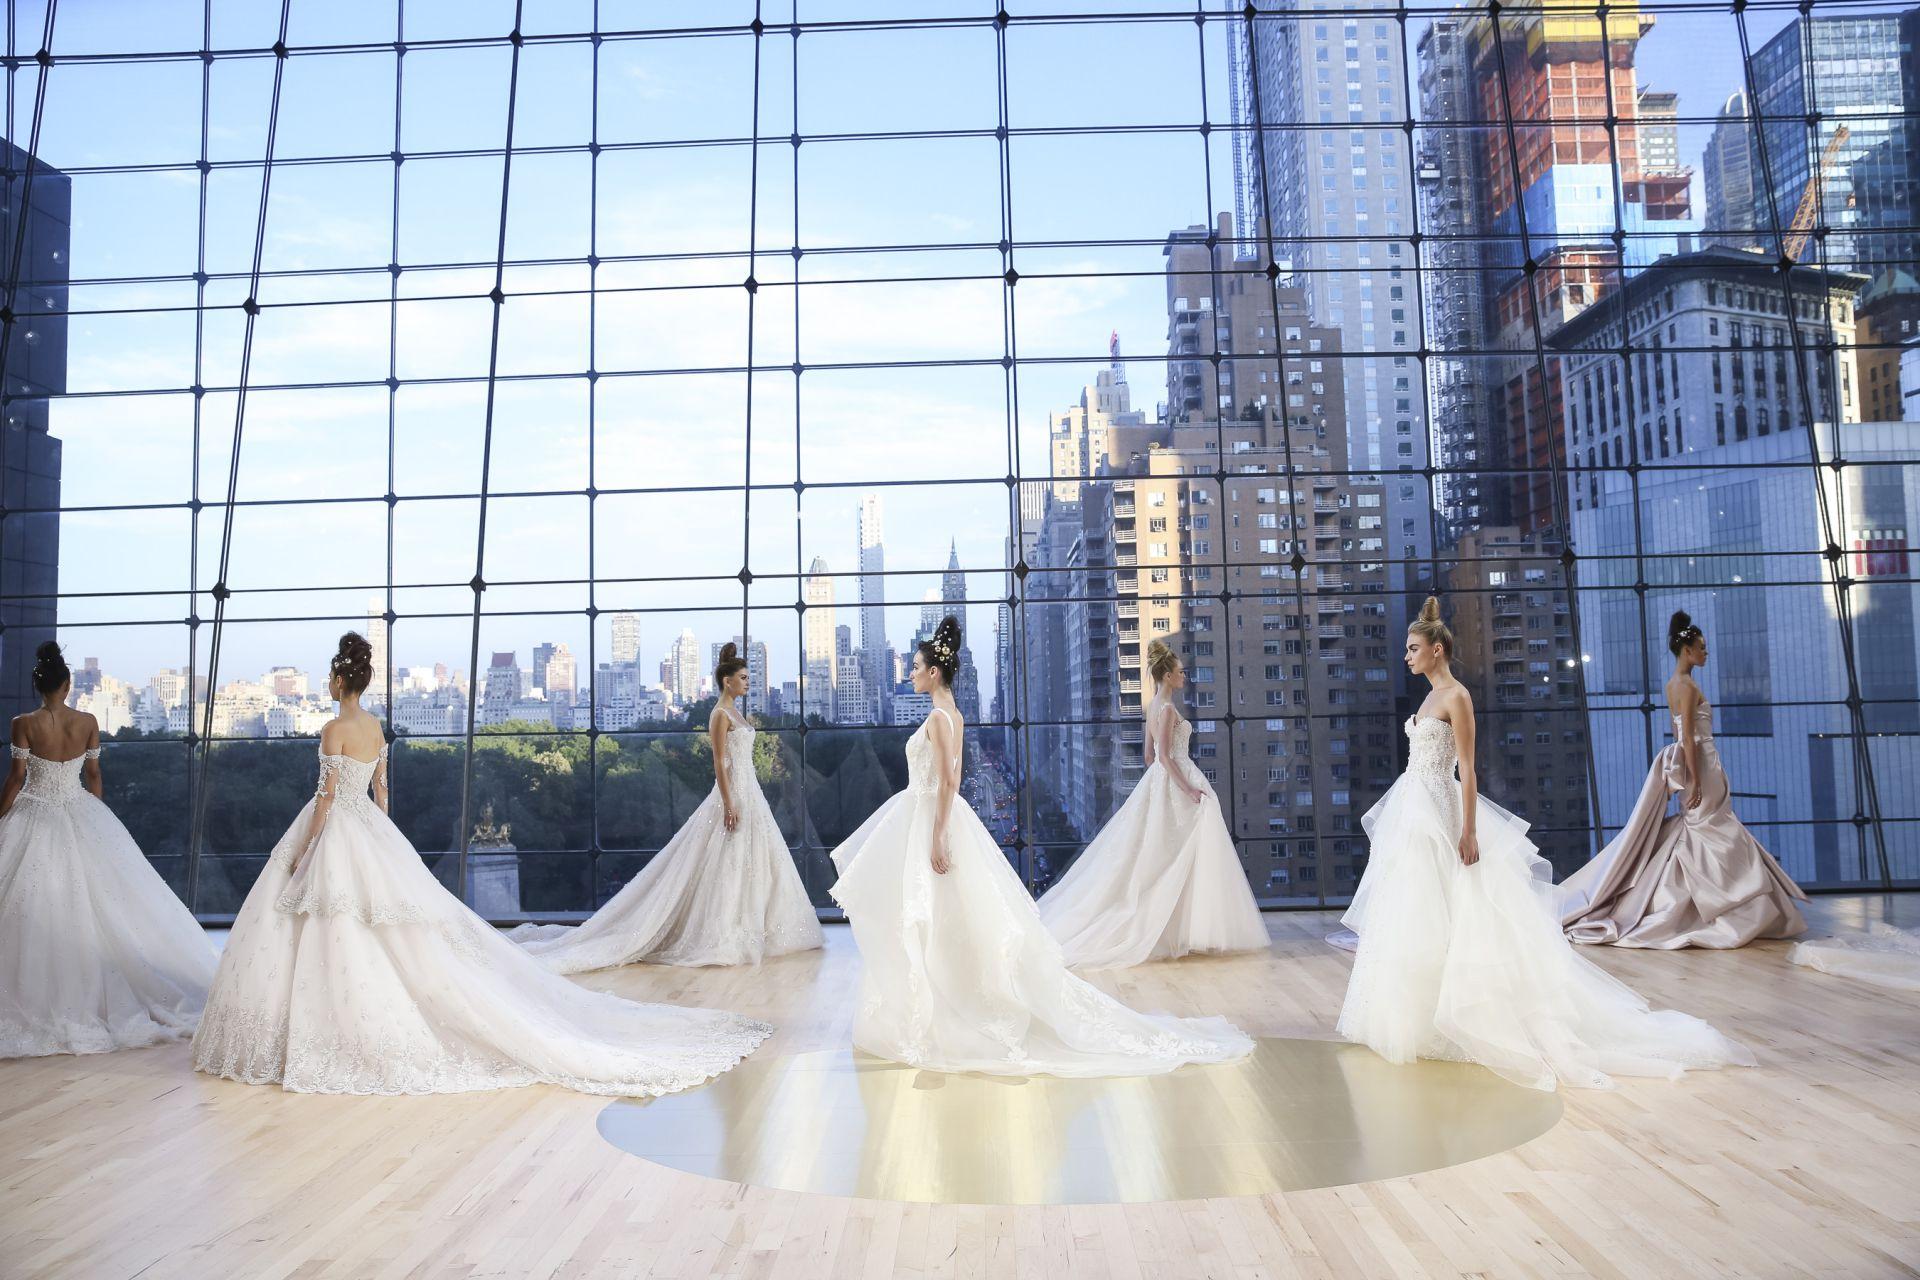 A parade of princess brides dressed by Ines Di Santo.